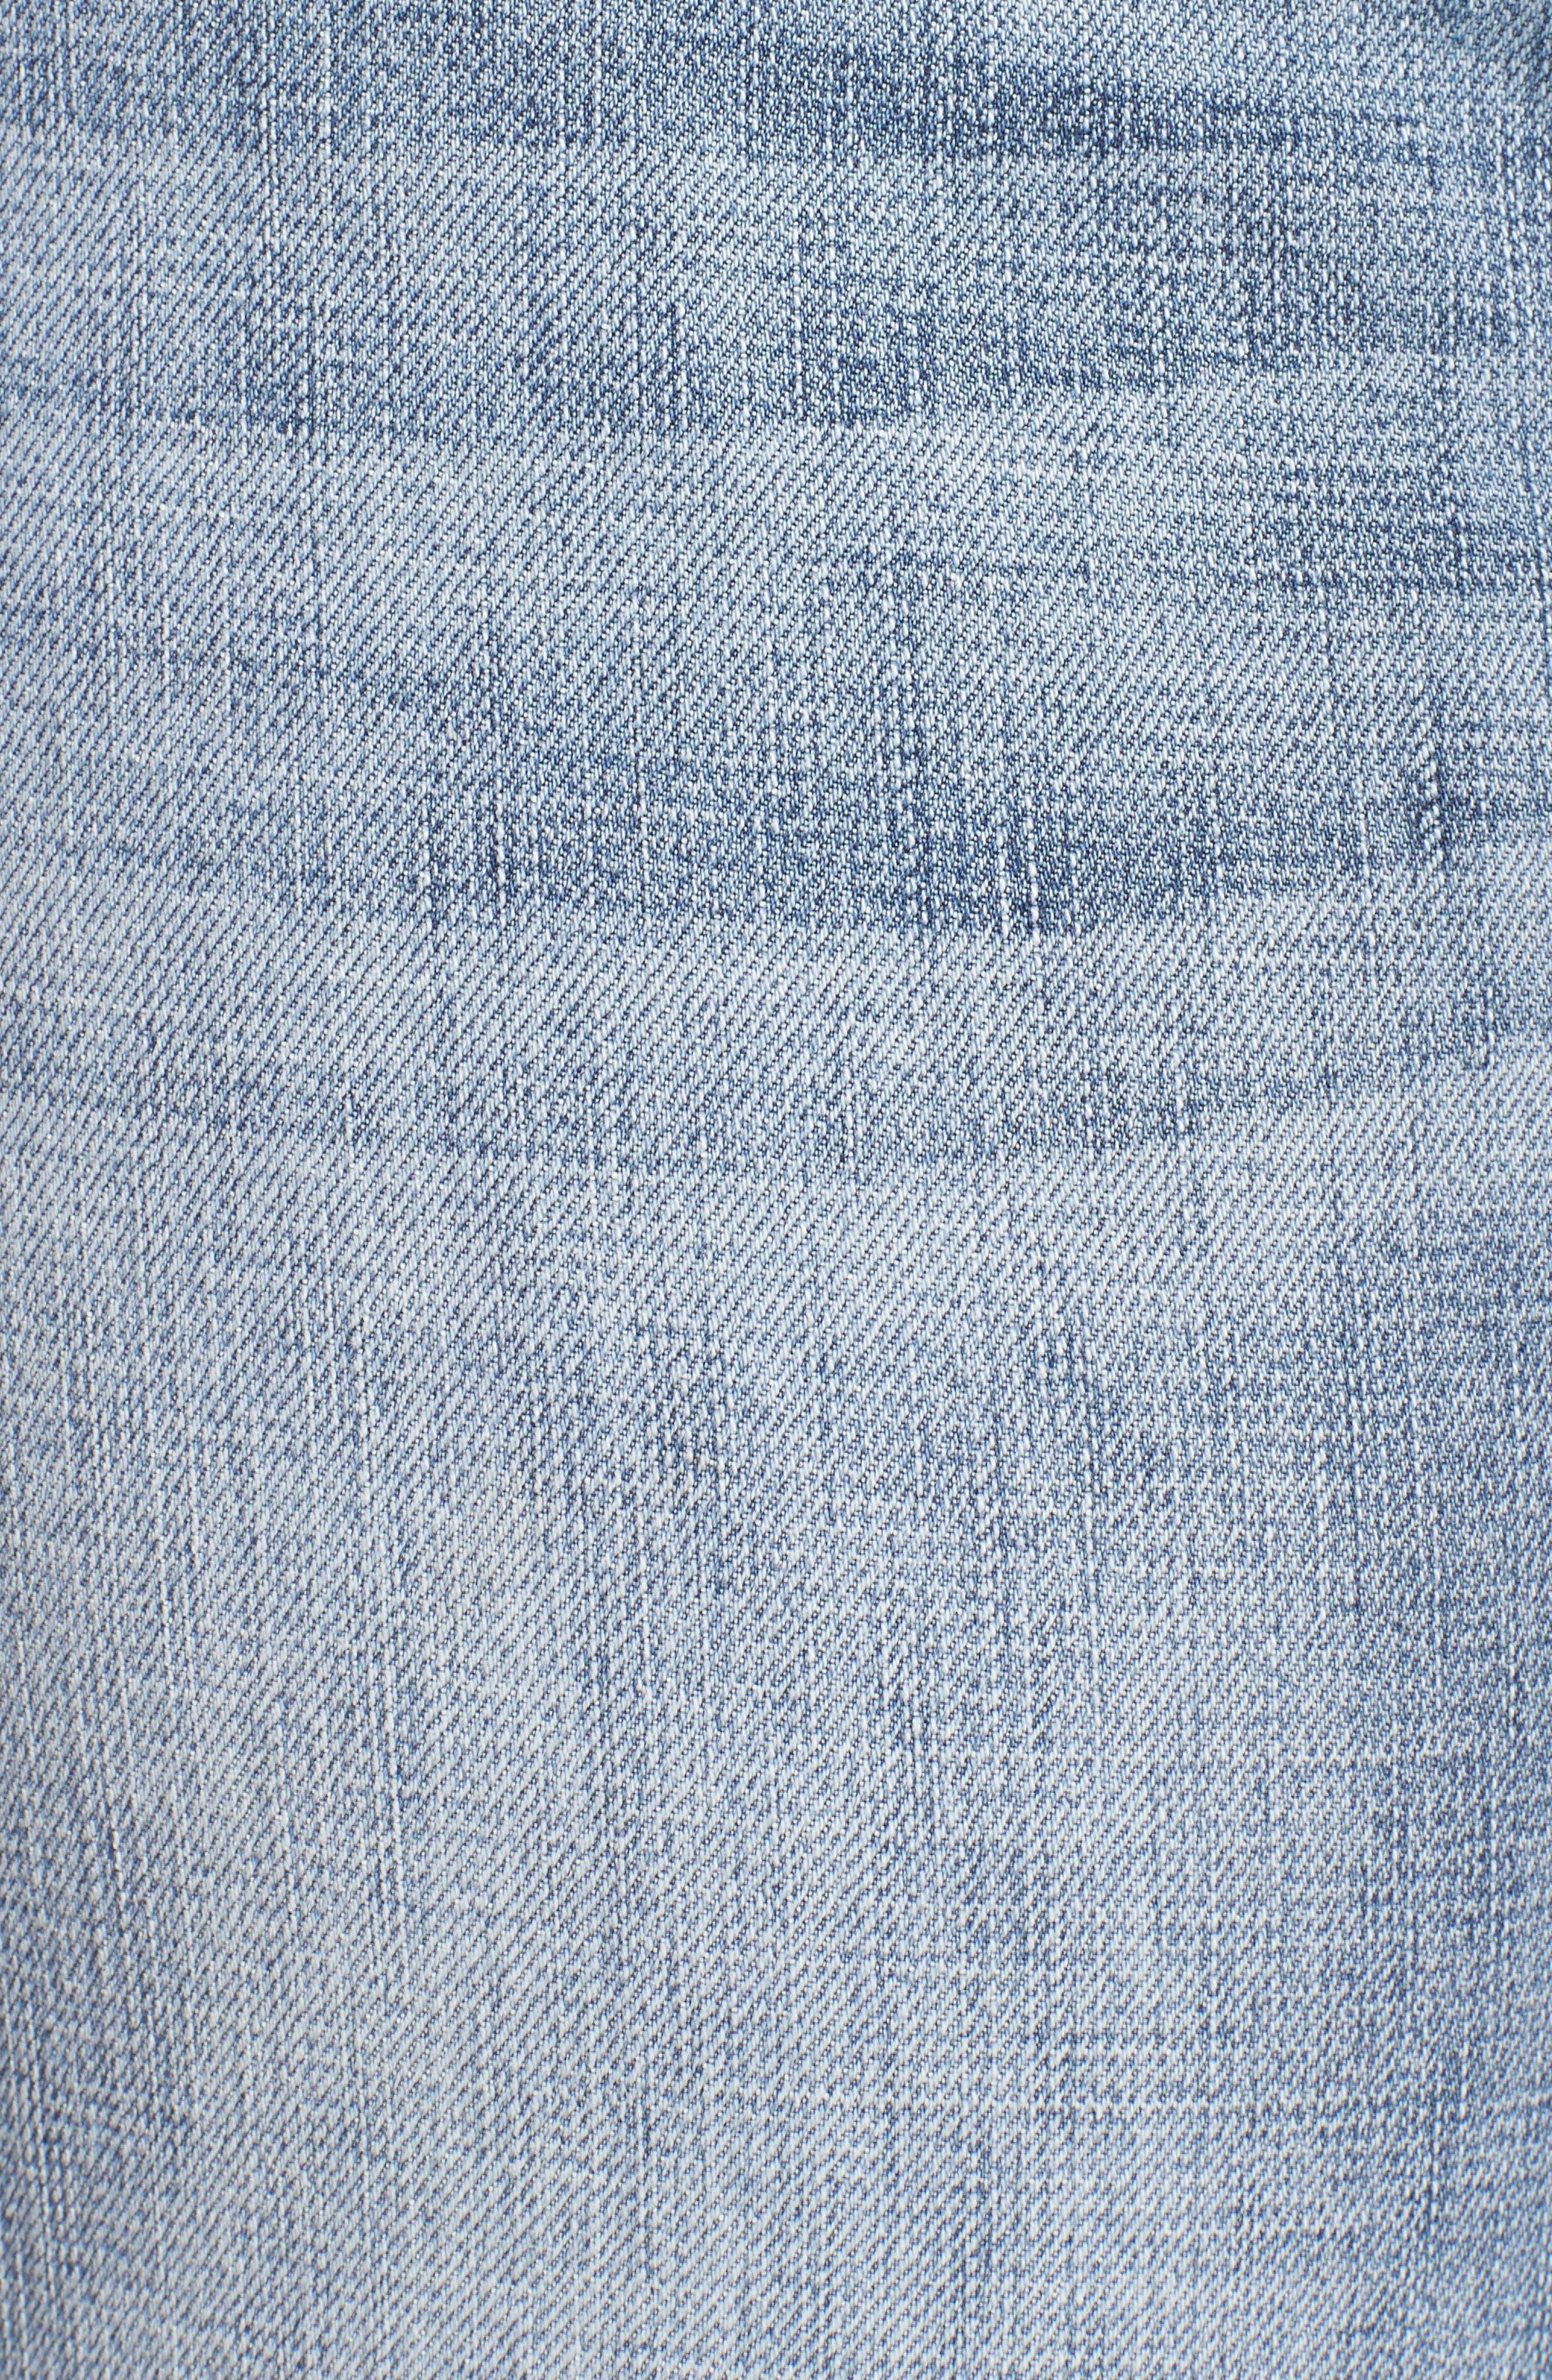 Alternate Image 7  - KUT from the Kloth Catherine Fray Hem Distressed Boyfriend Jeans (Plus Size)